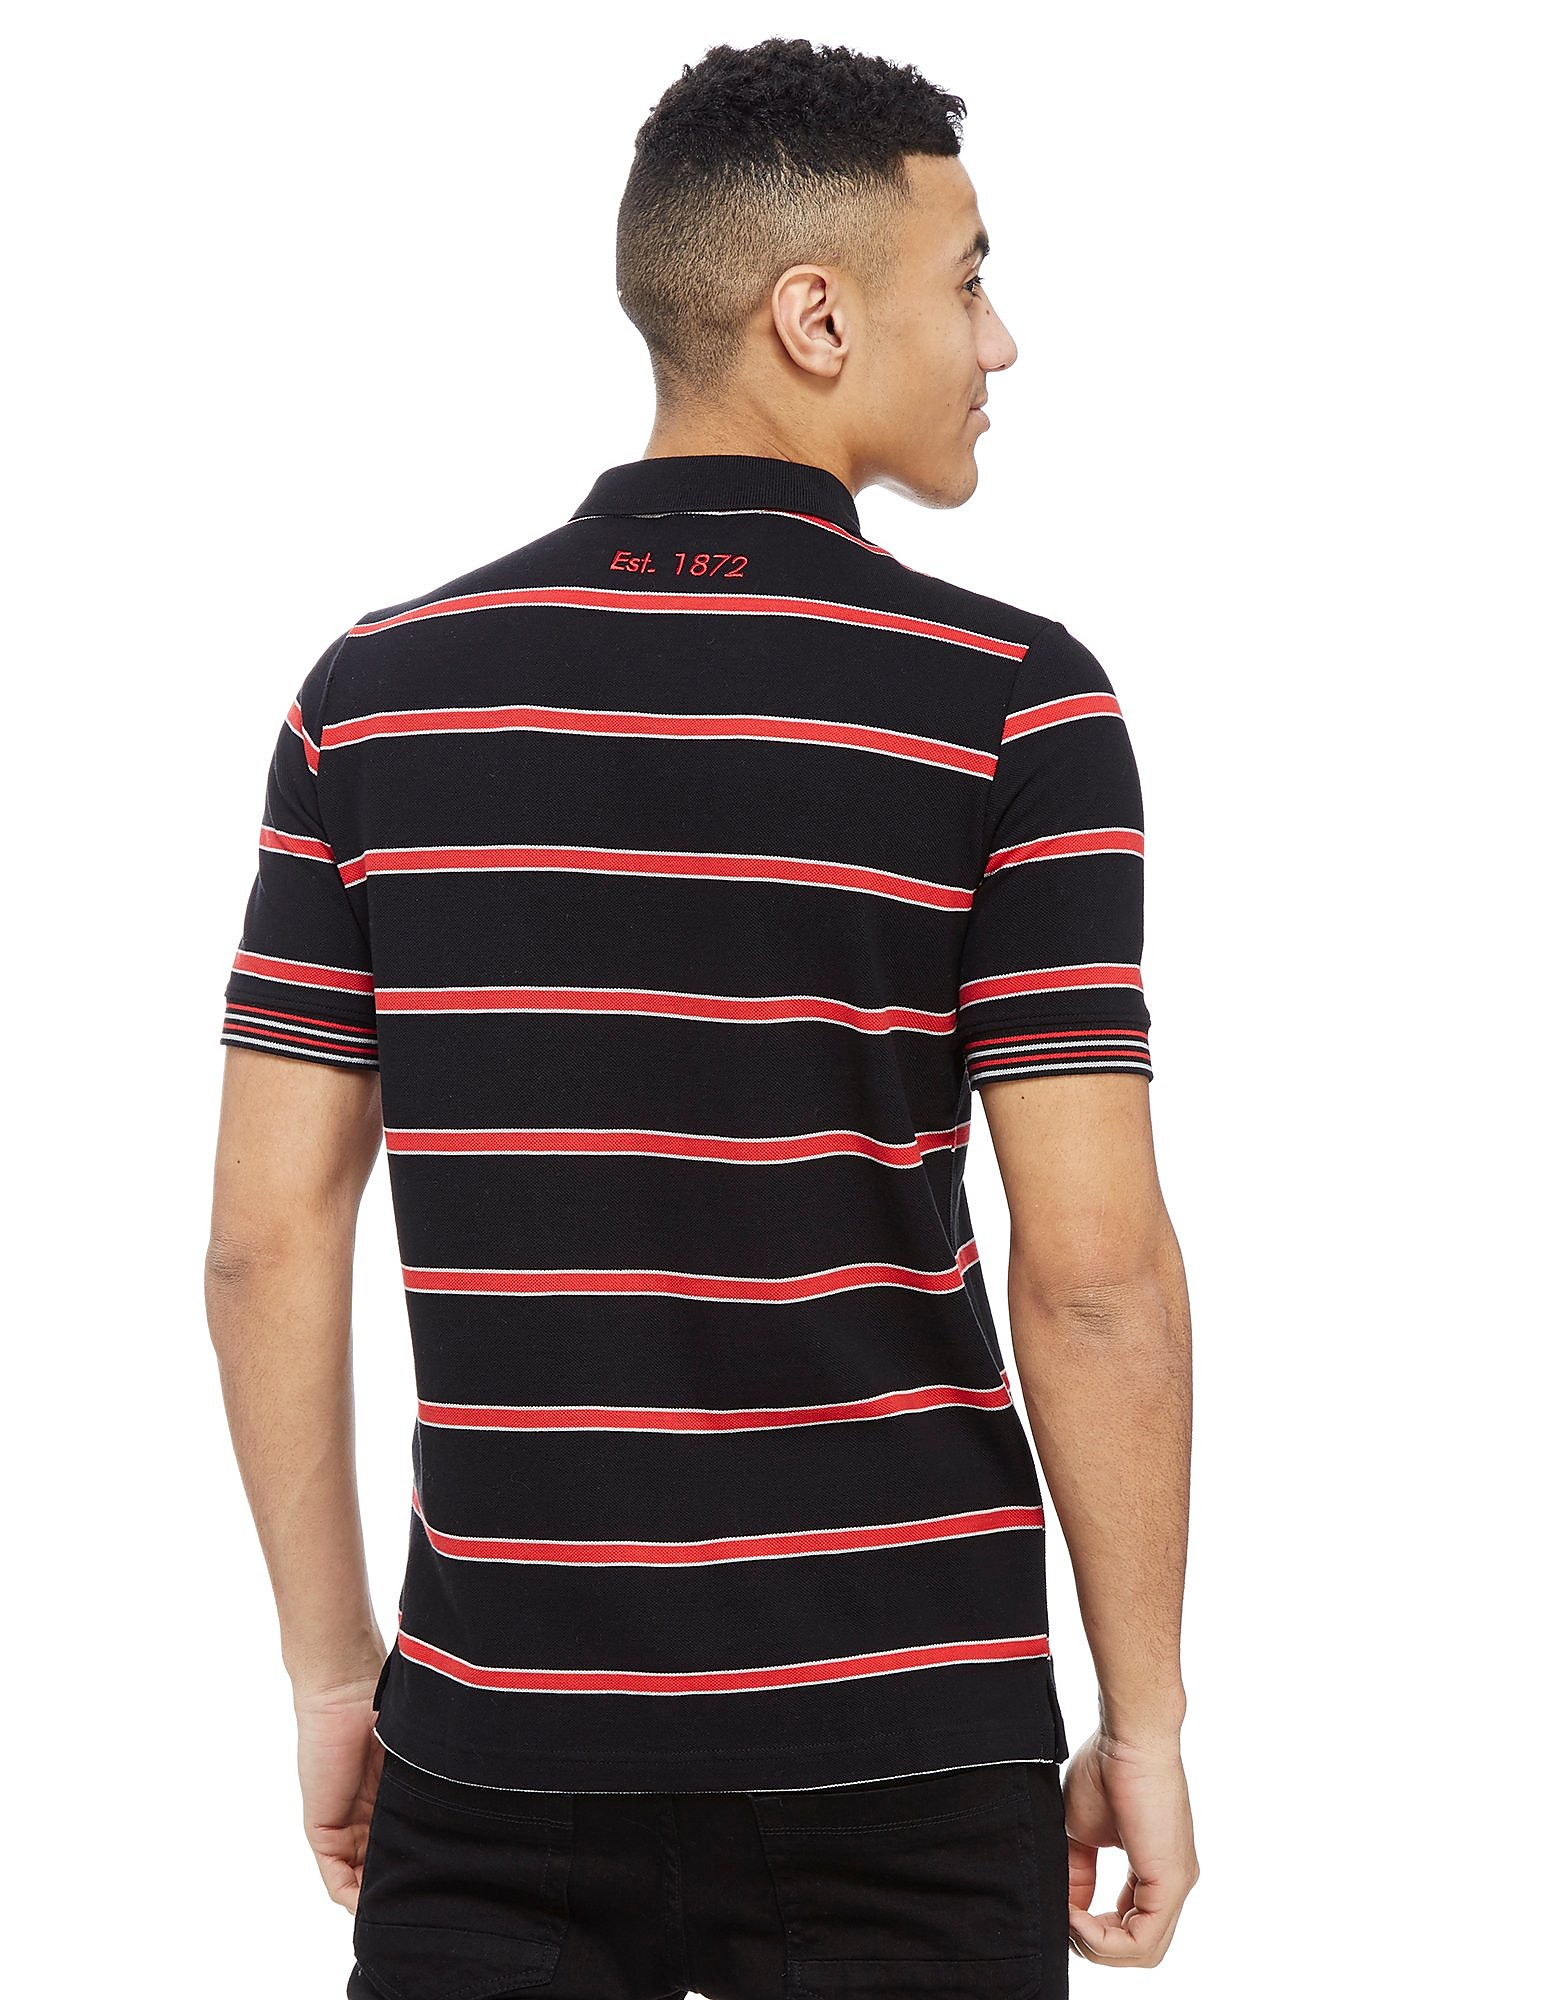 Macron Edinburgh Rugby Polo Shirt